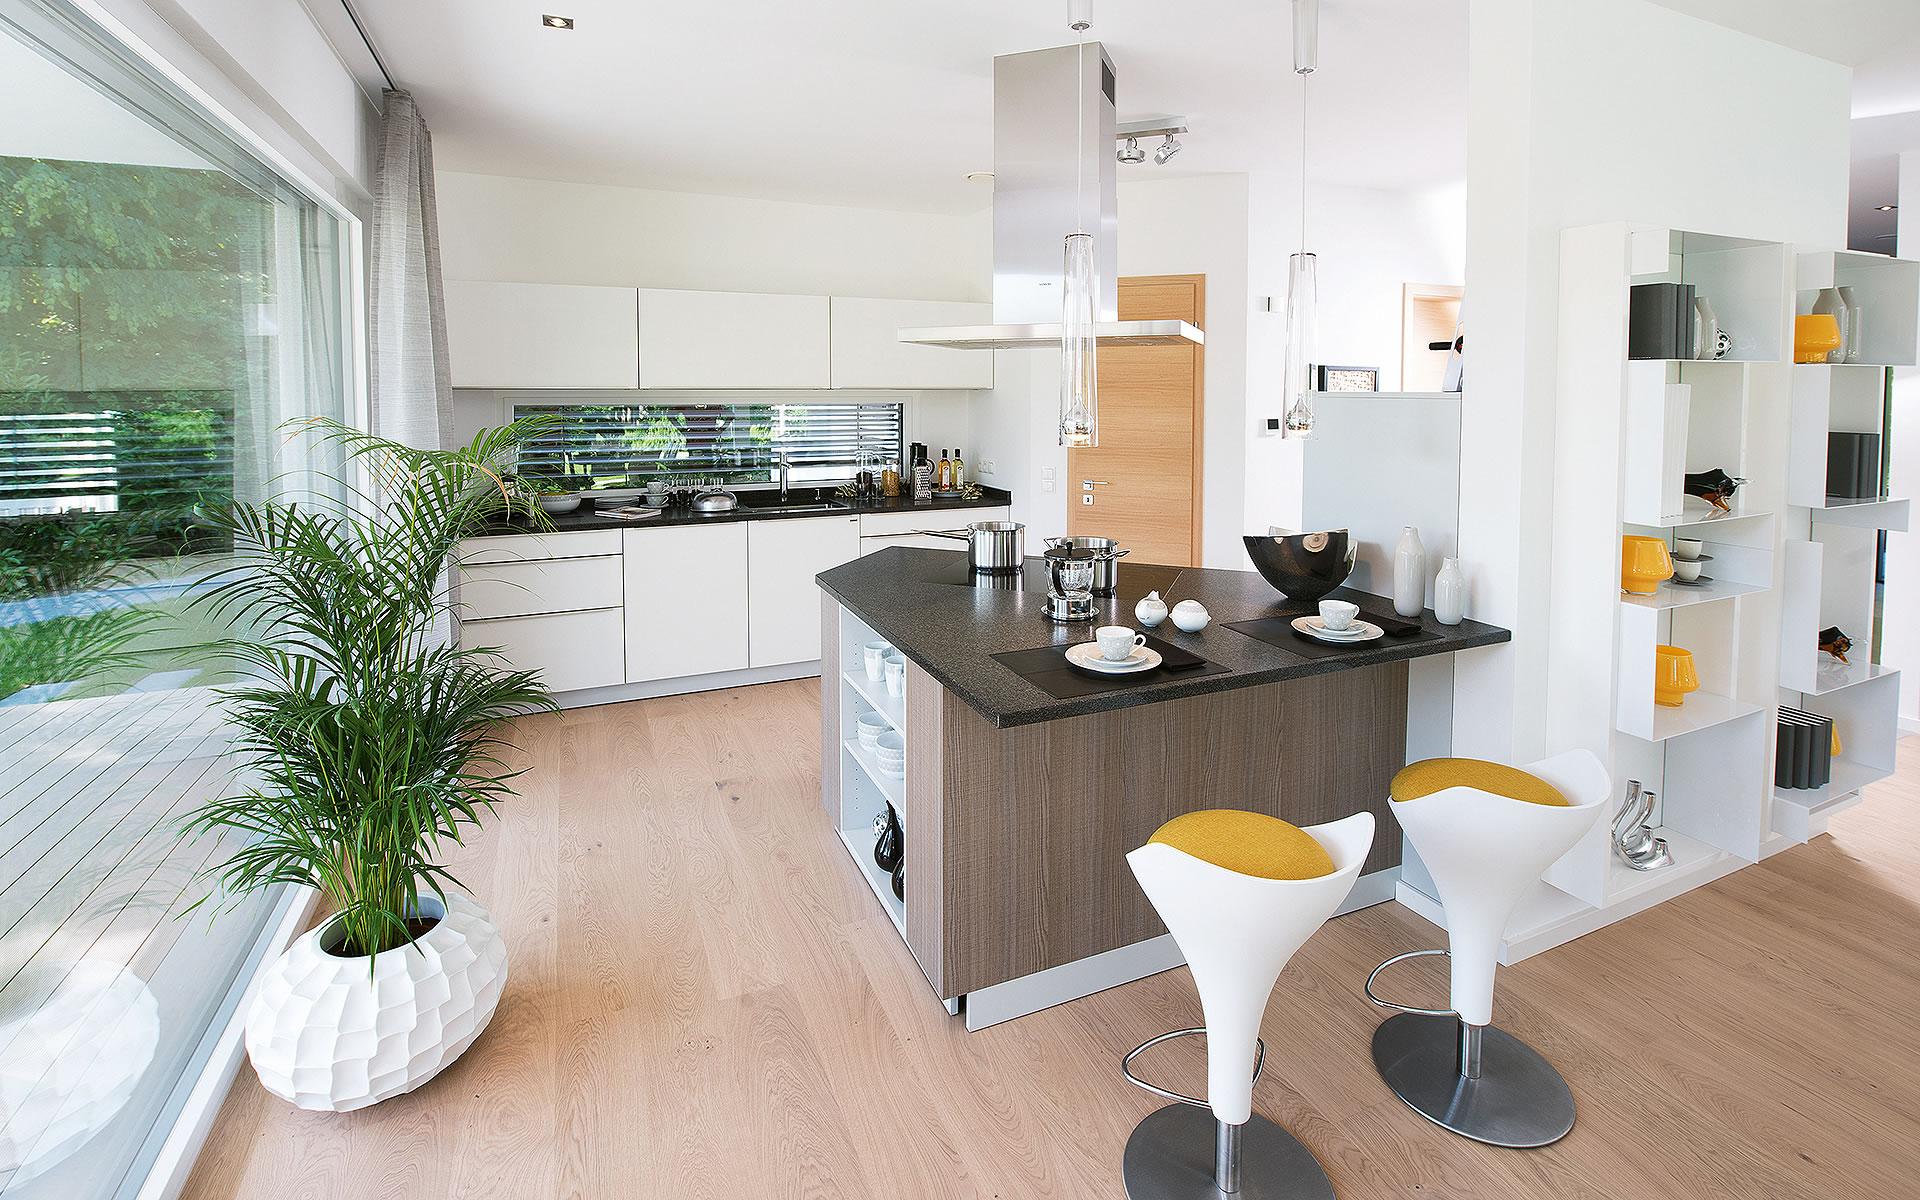 Musterhaus Rheinau-Linx (CityLife) von WeberHaus GmbH & Co. KG